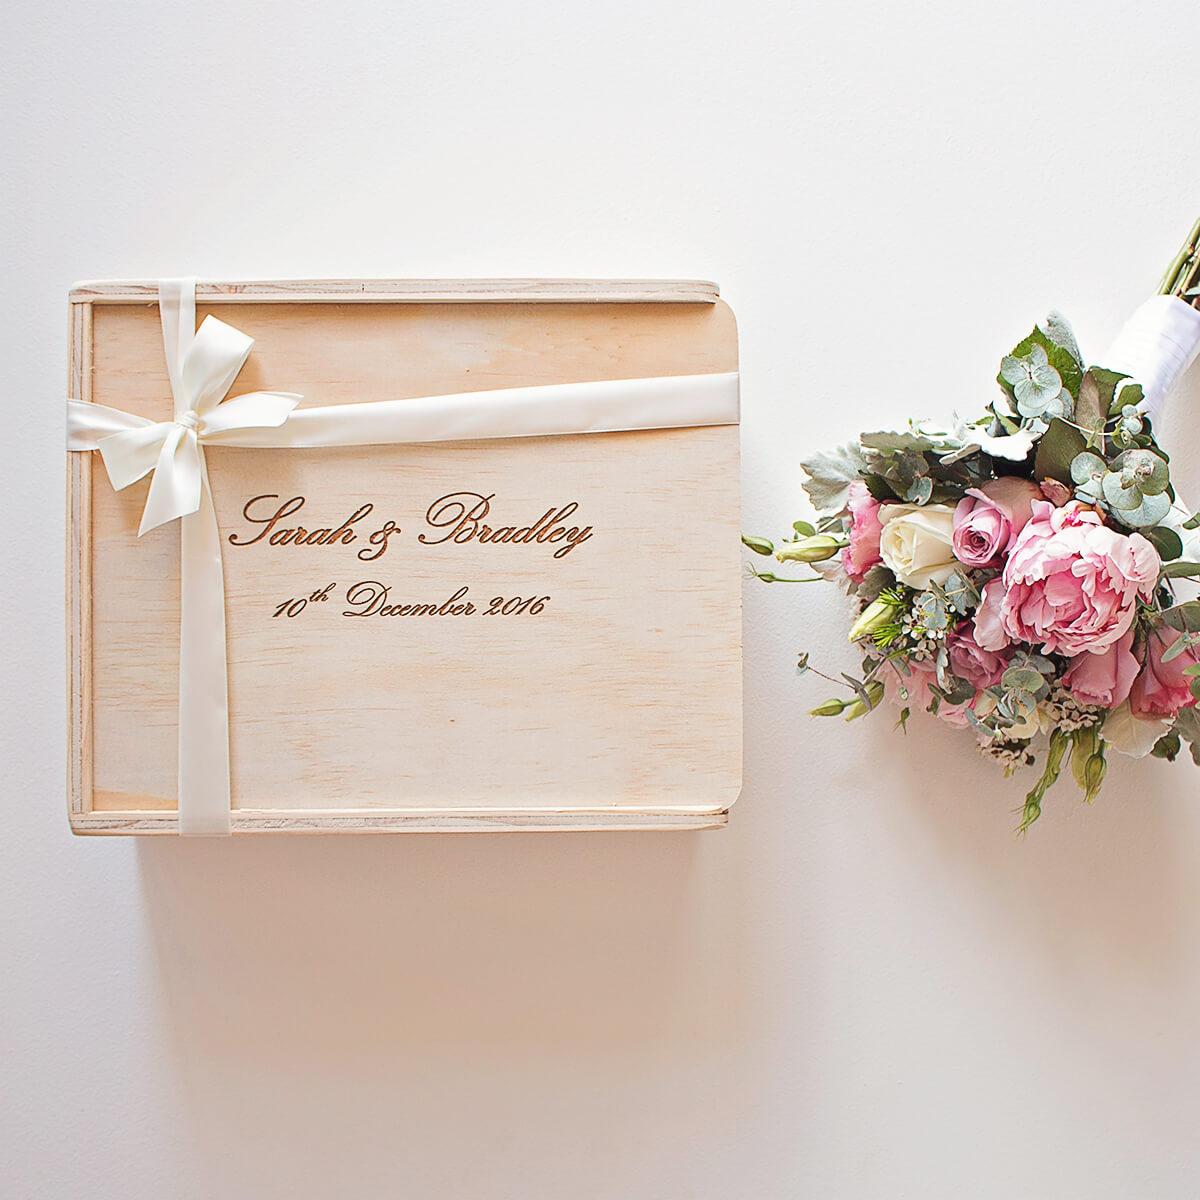 Brides Box: Bride & Groom Custom Engraved Gift Box